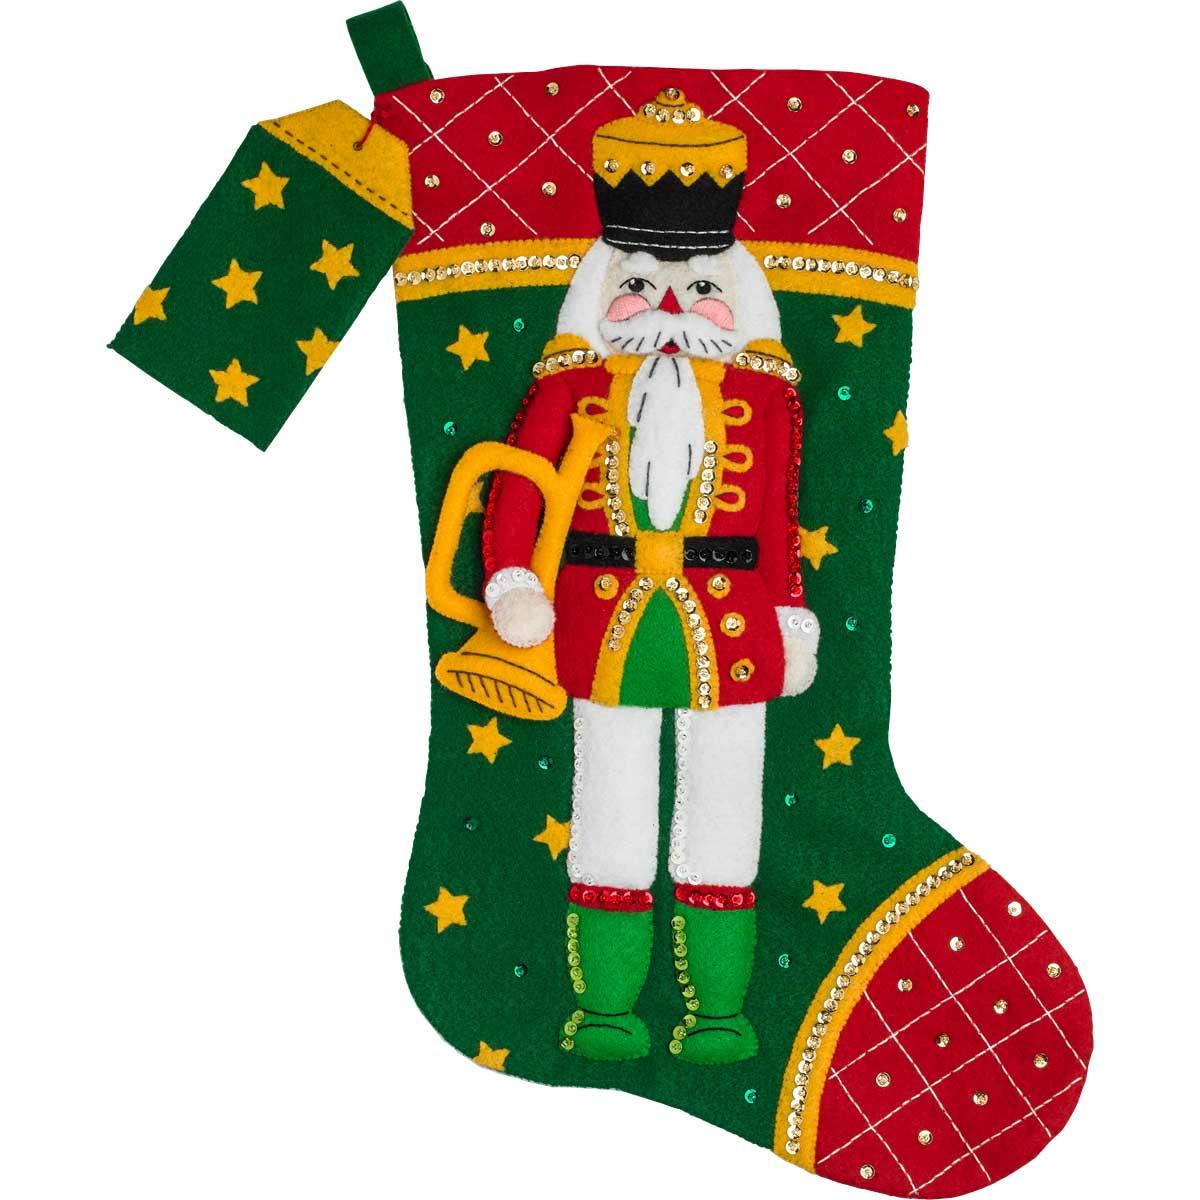 Bucilla ® Seasonal - Felt - Stocking Kits - Hallmark - Christmas Classic Nutcracker